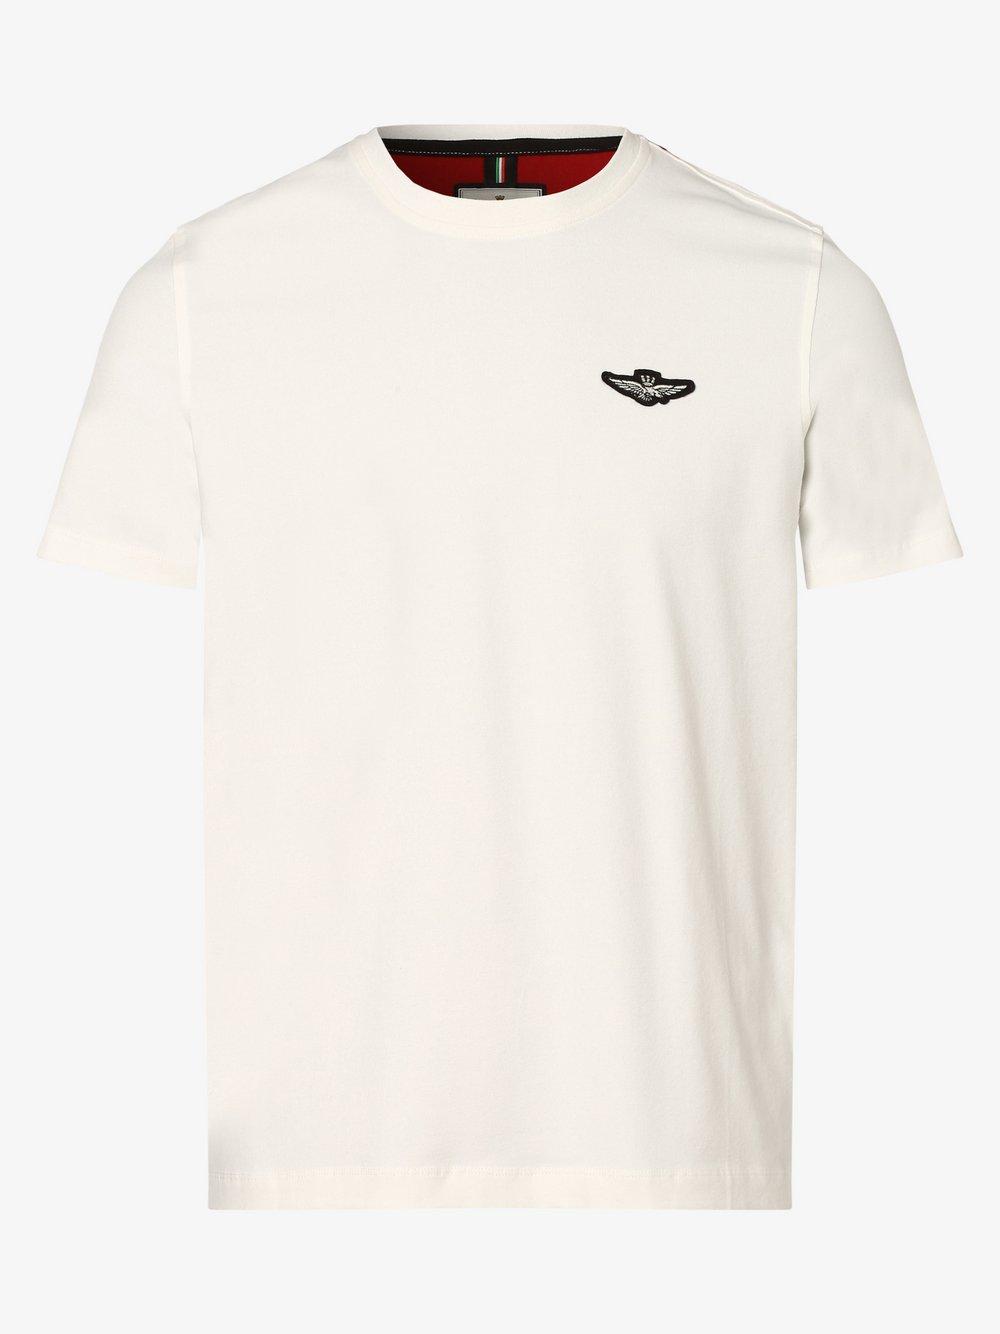 Aeronautica – T-shirt męski, biały Van Graaf 477204-0003-09920